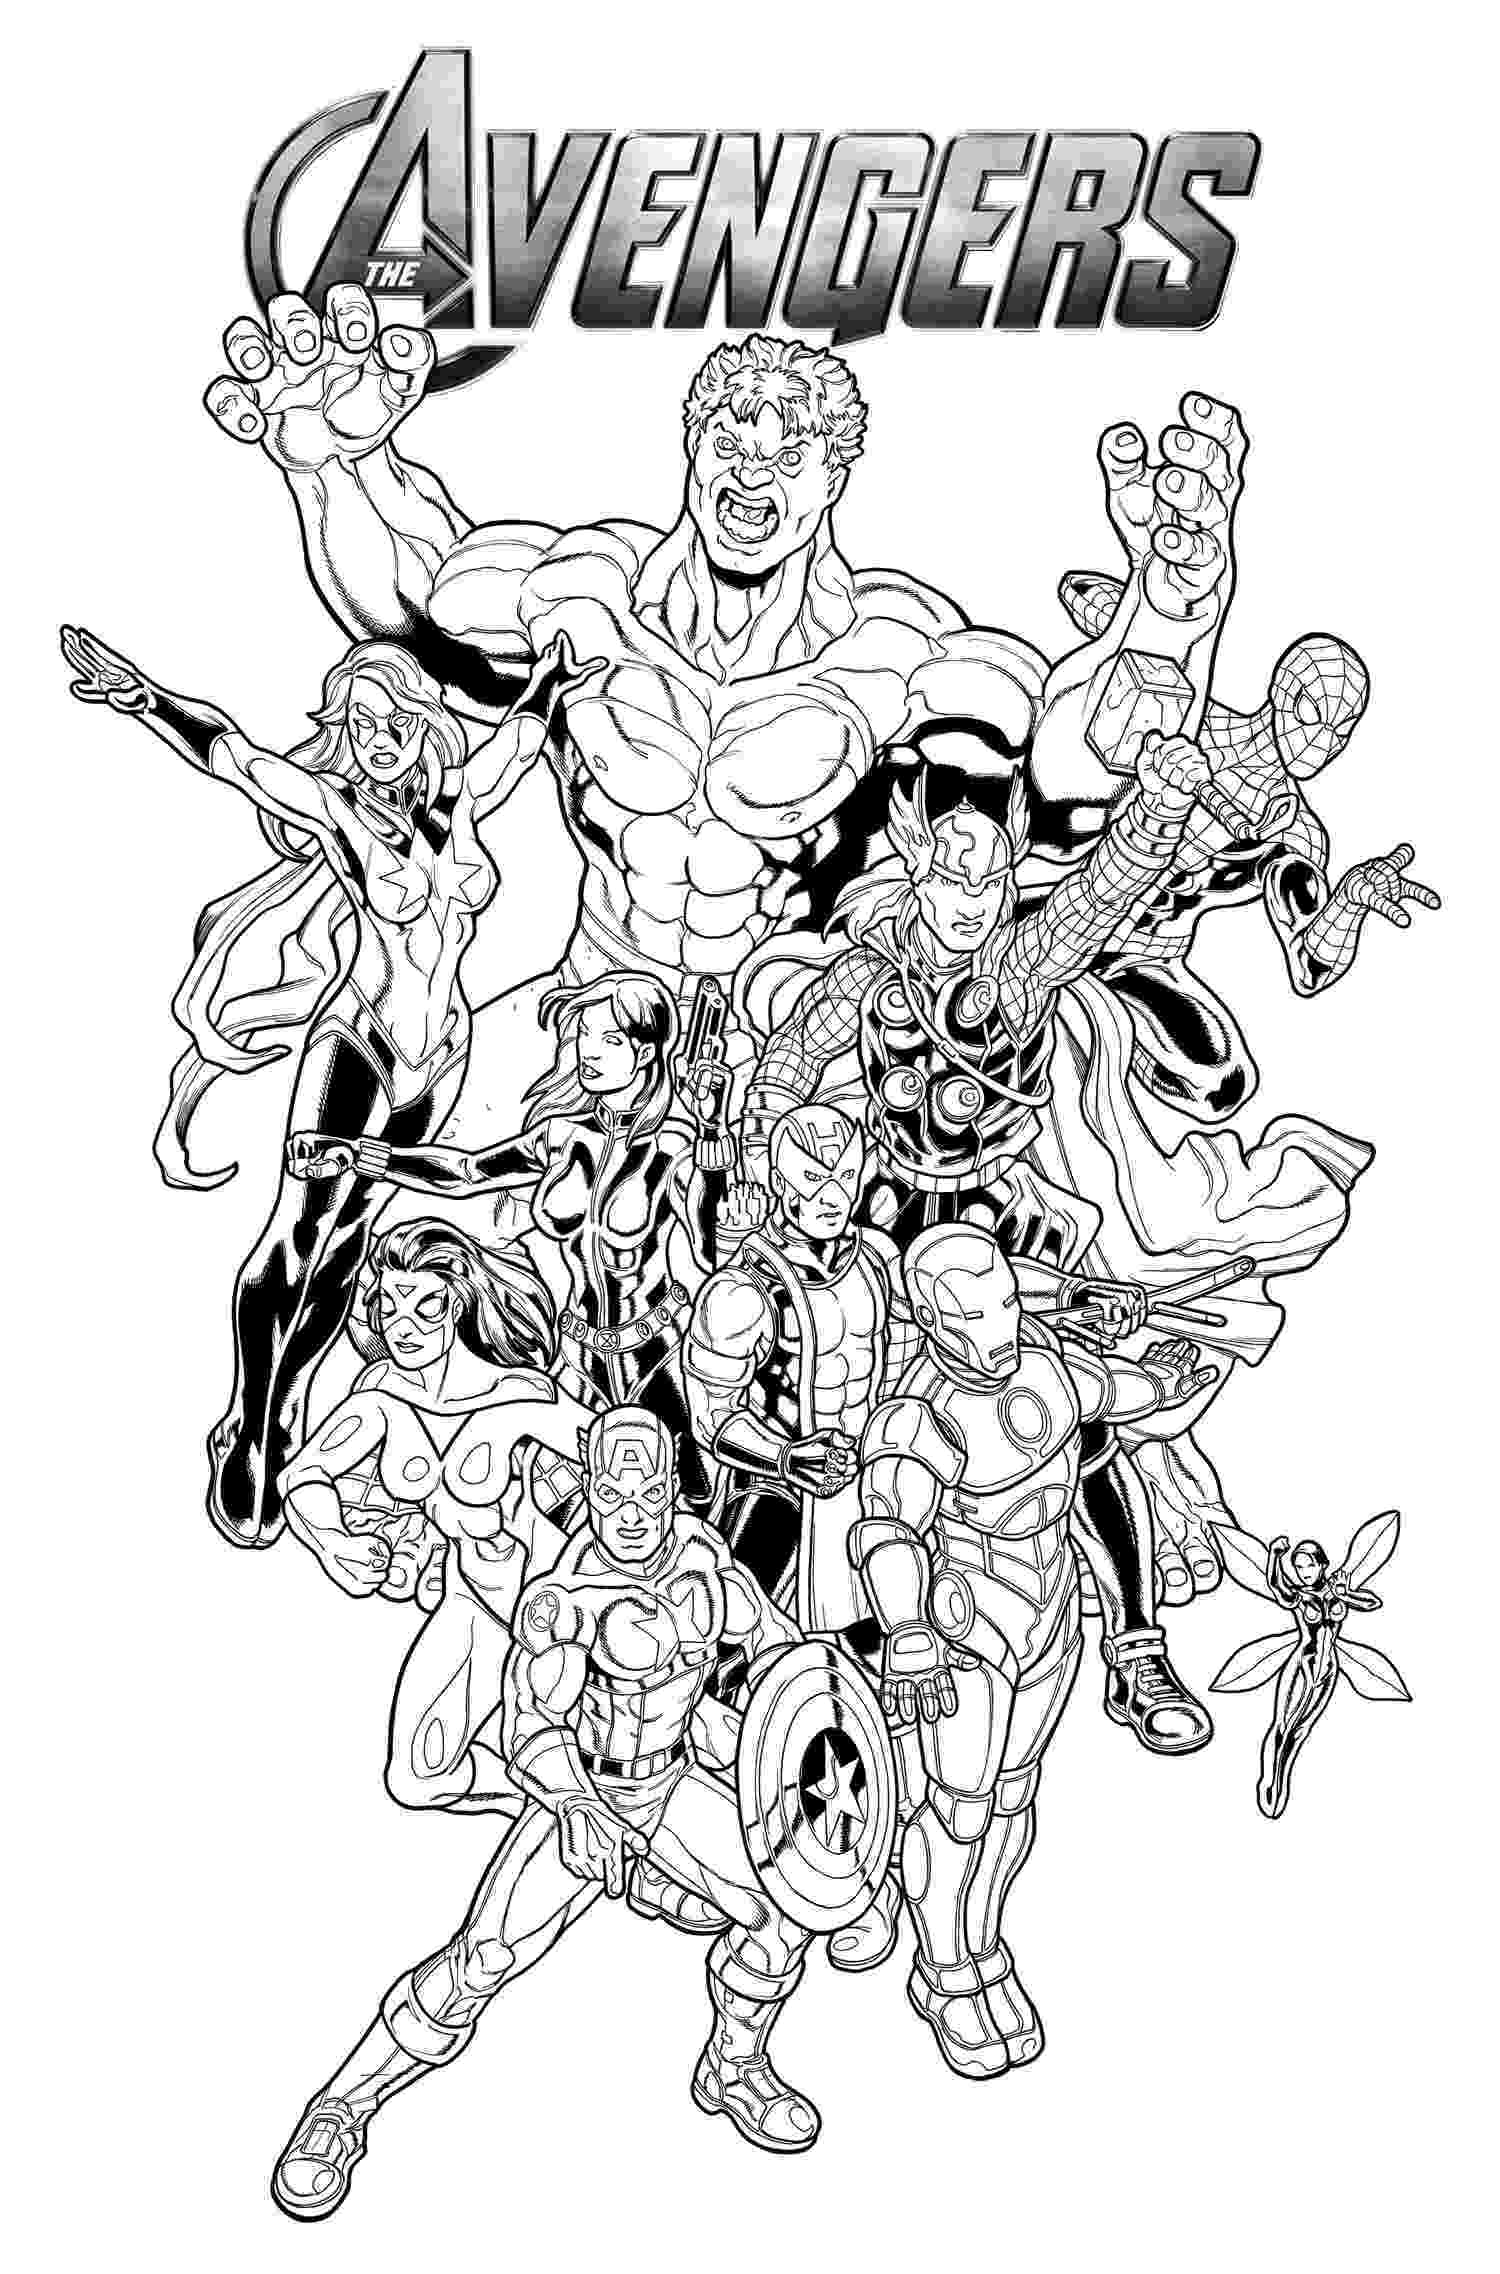 avengers coloring sheet avengers coloring pages best coloring pages for kids avengers coloring sheet